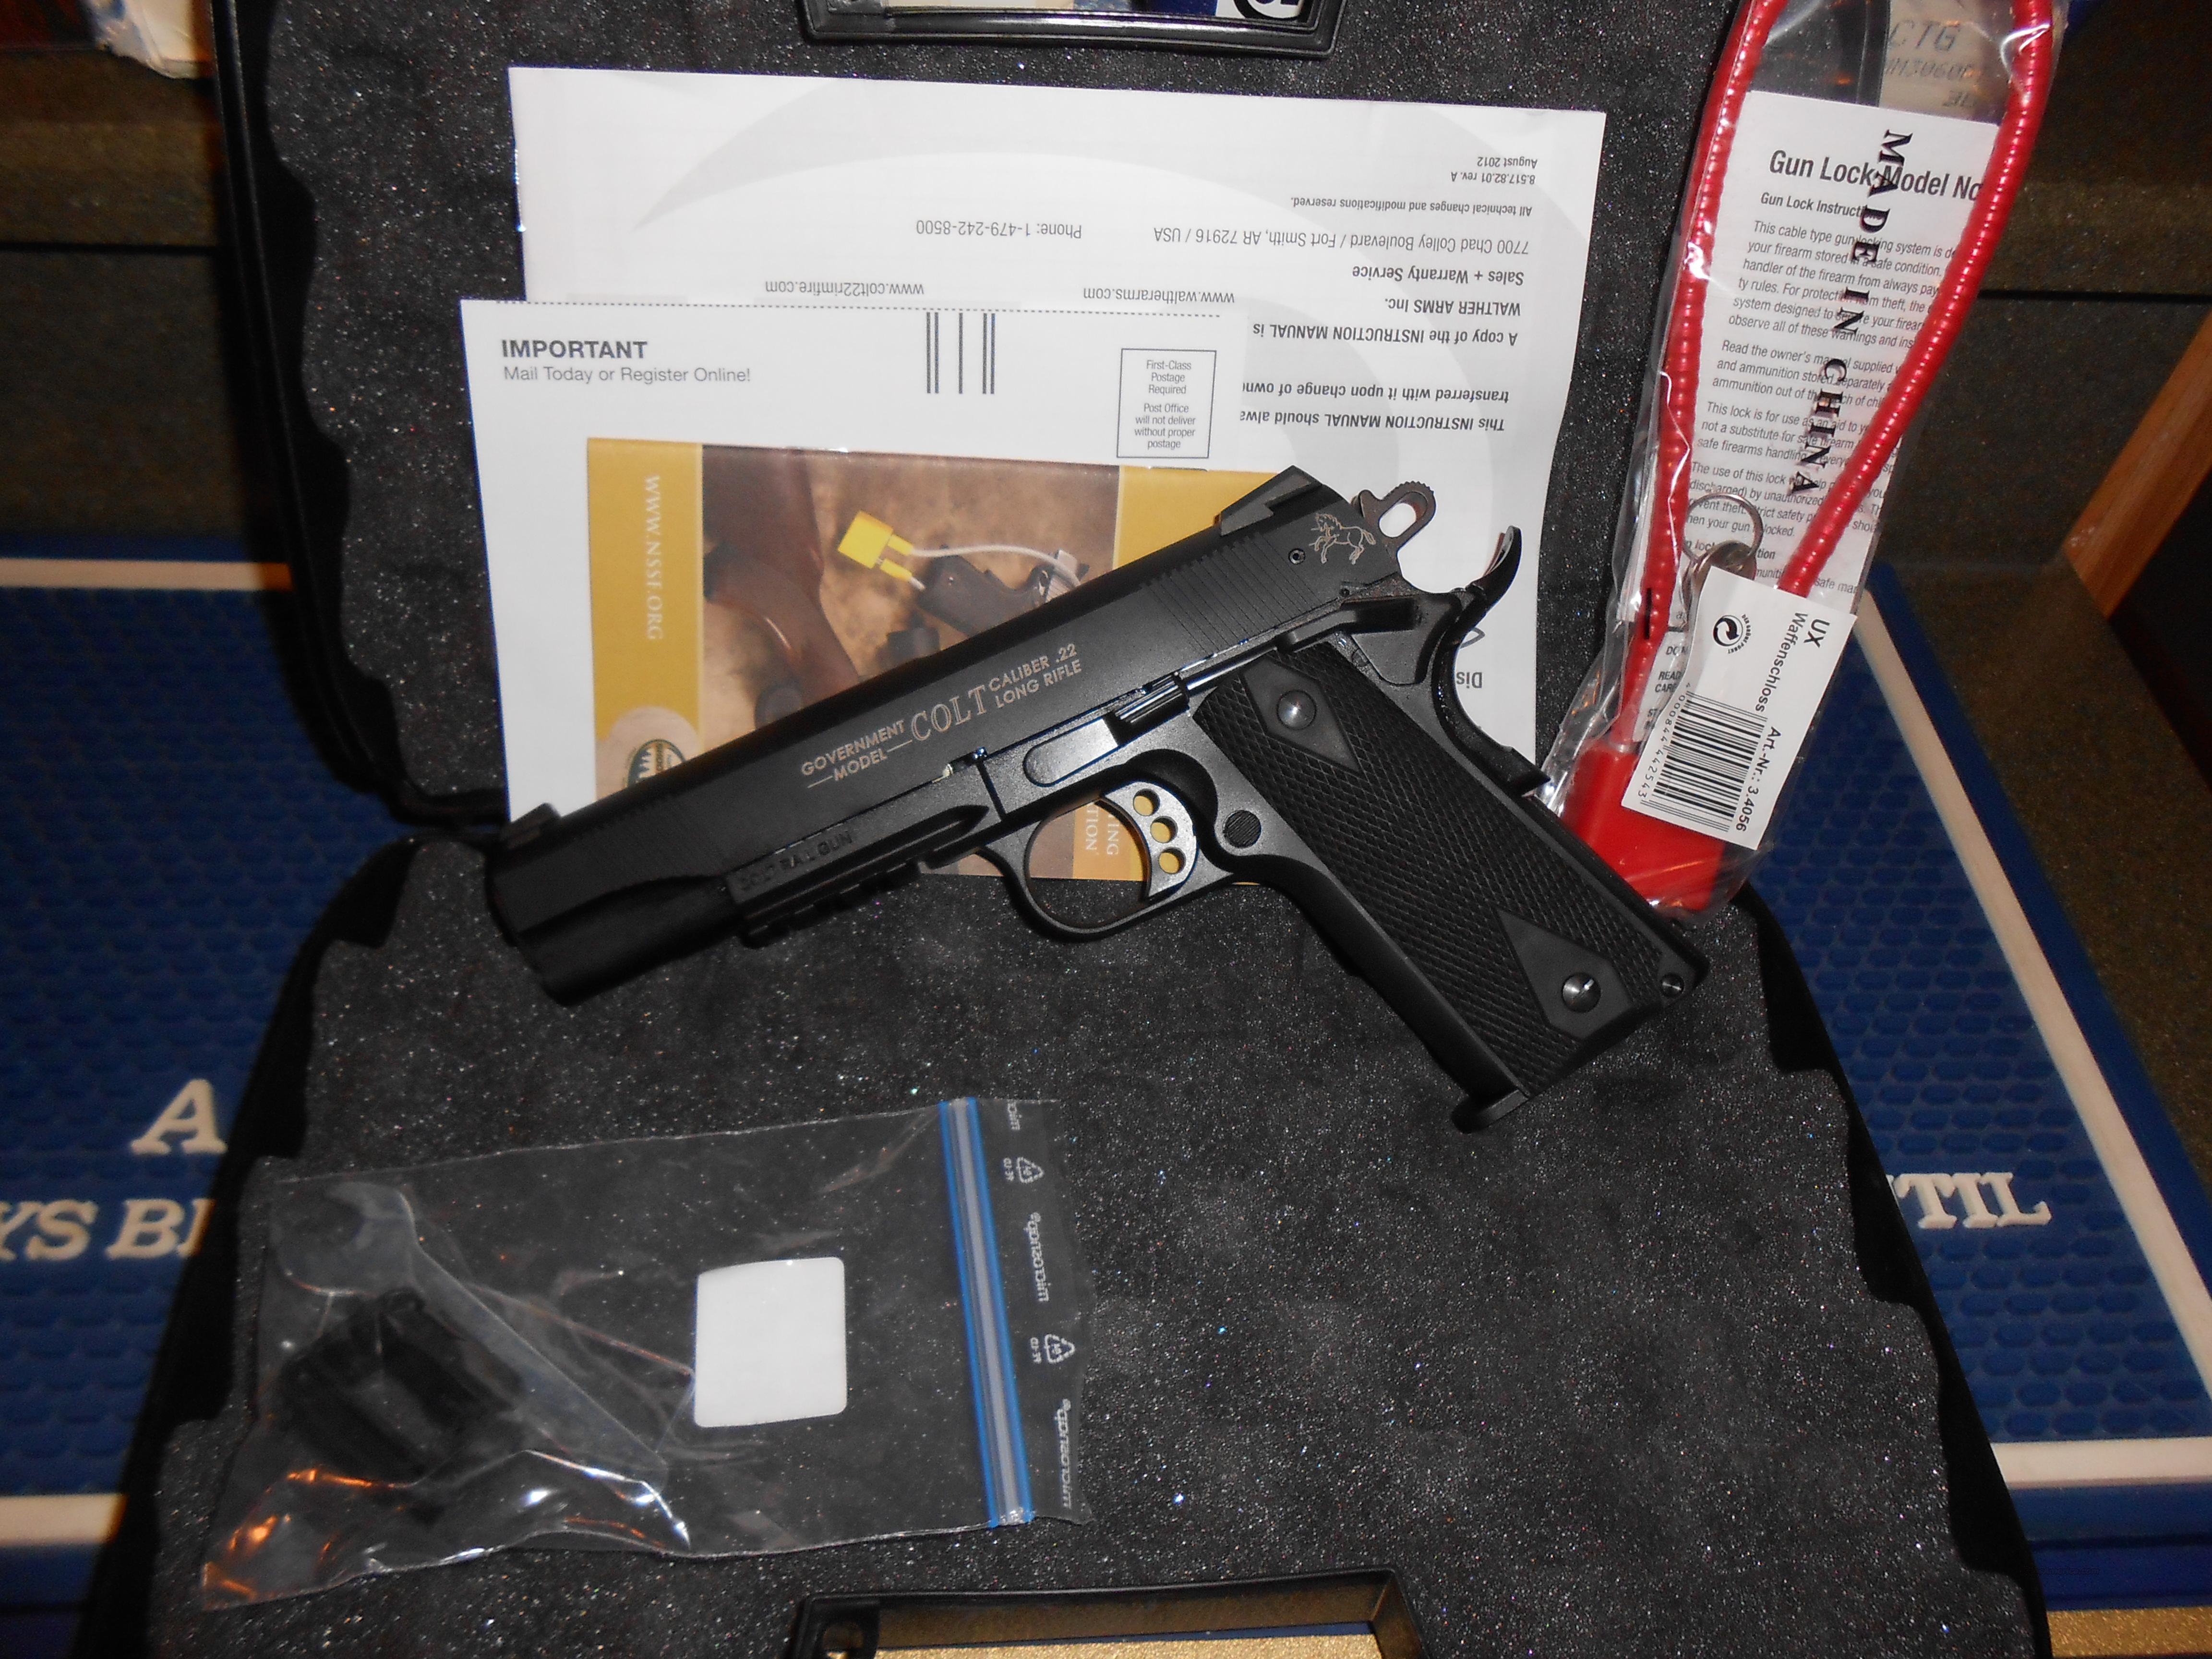 Colt 1911 Rail Gun 22Lr.  Guns > Pistols > Colt Automatic Pistols (22 Cal.)